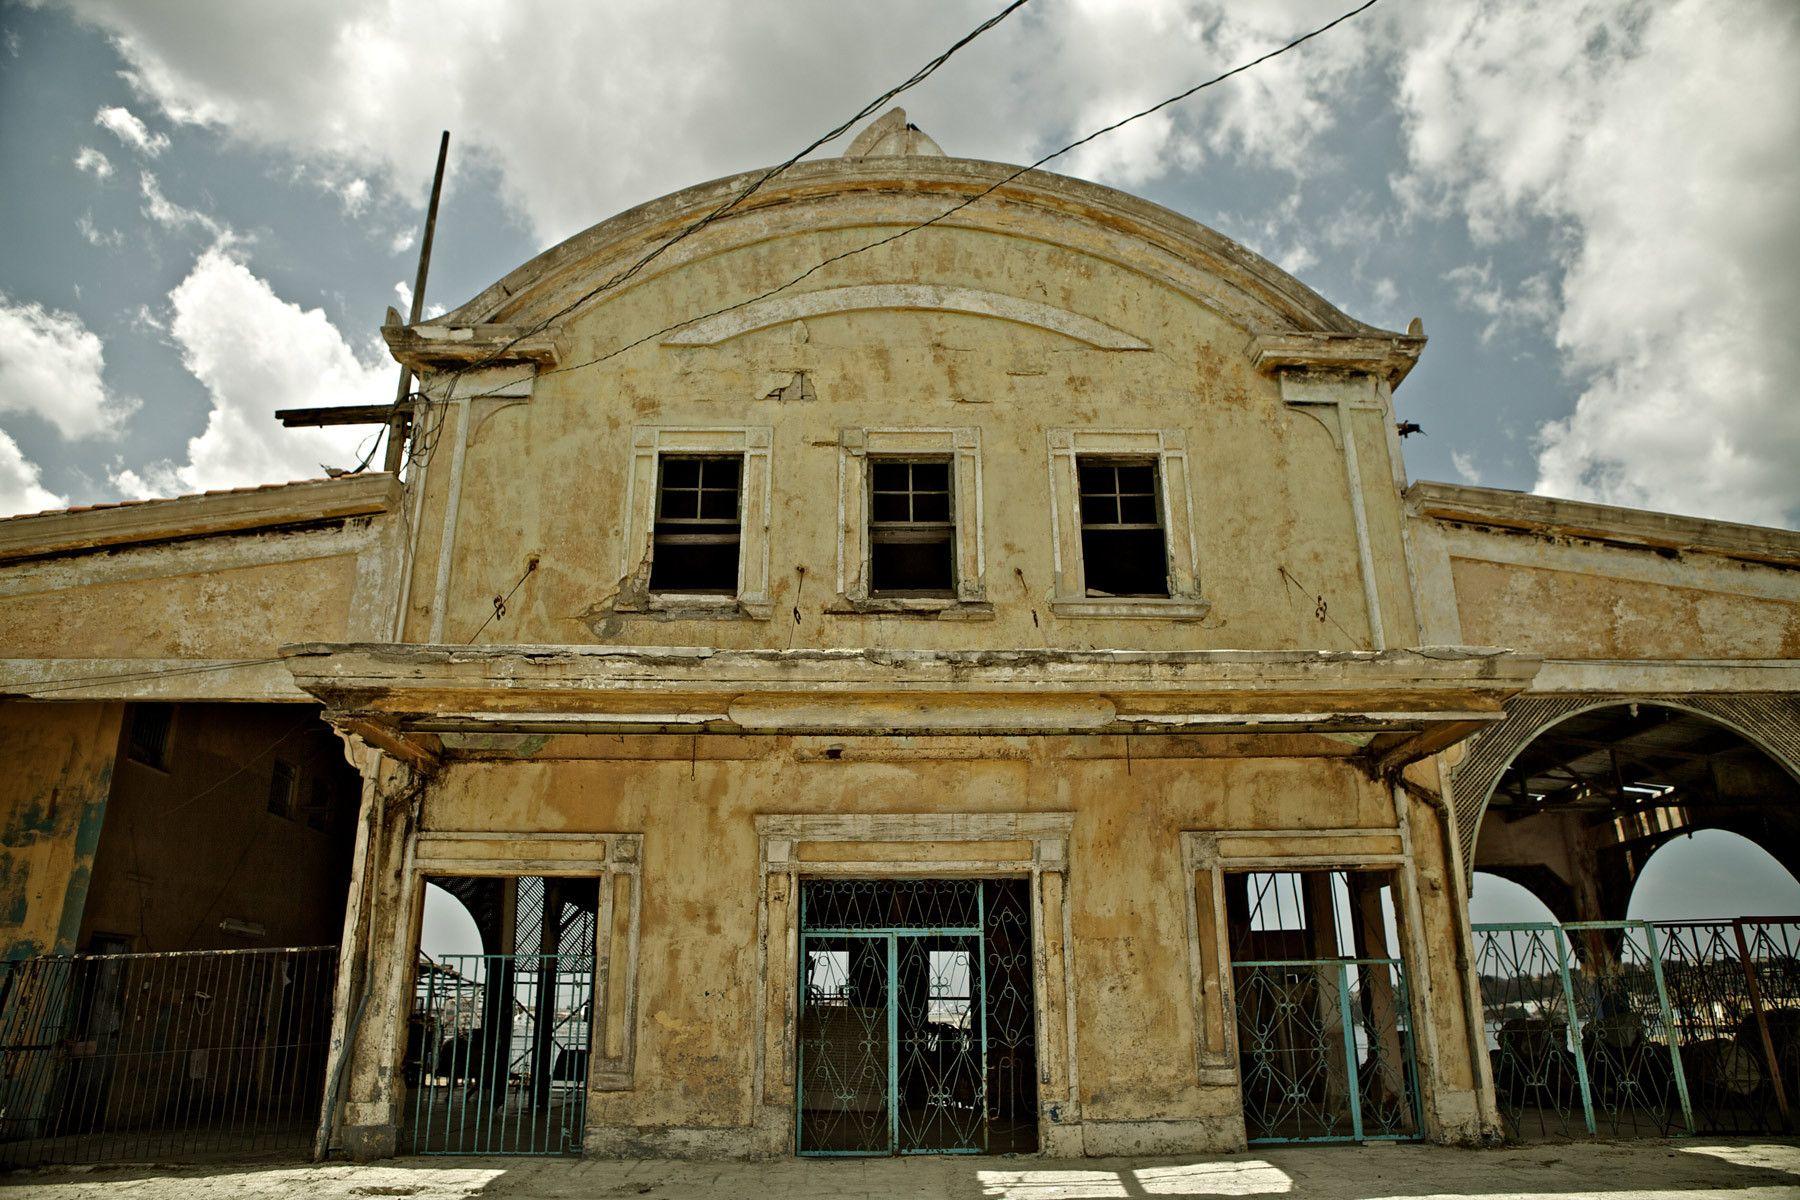 1abadoned_port_building_regla_cuba_bahia_de_la_habana.jpg